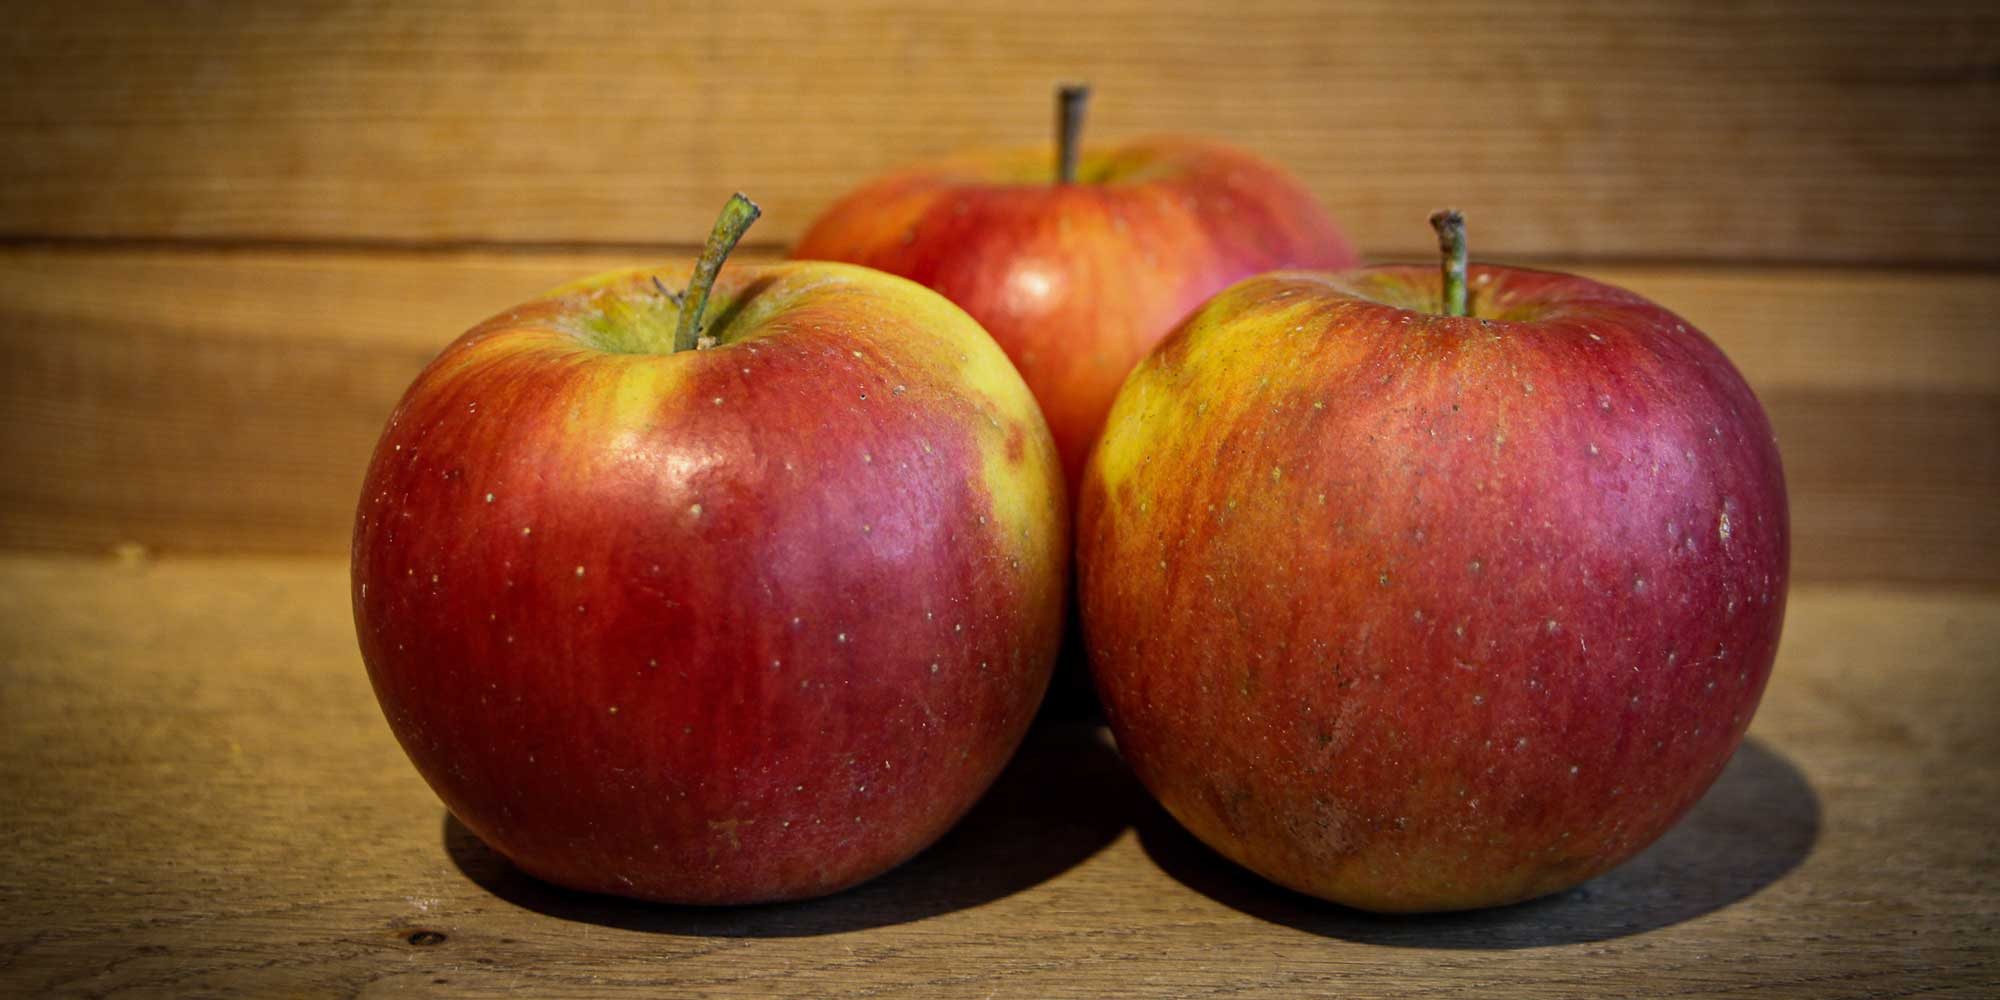 Ladina Apfelsorte